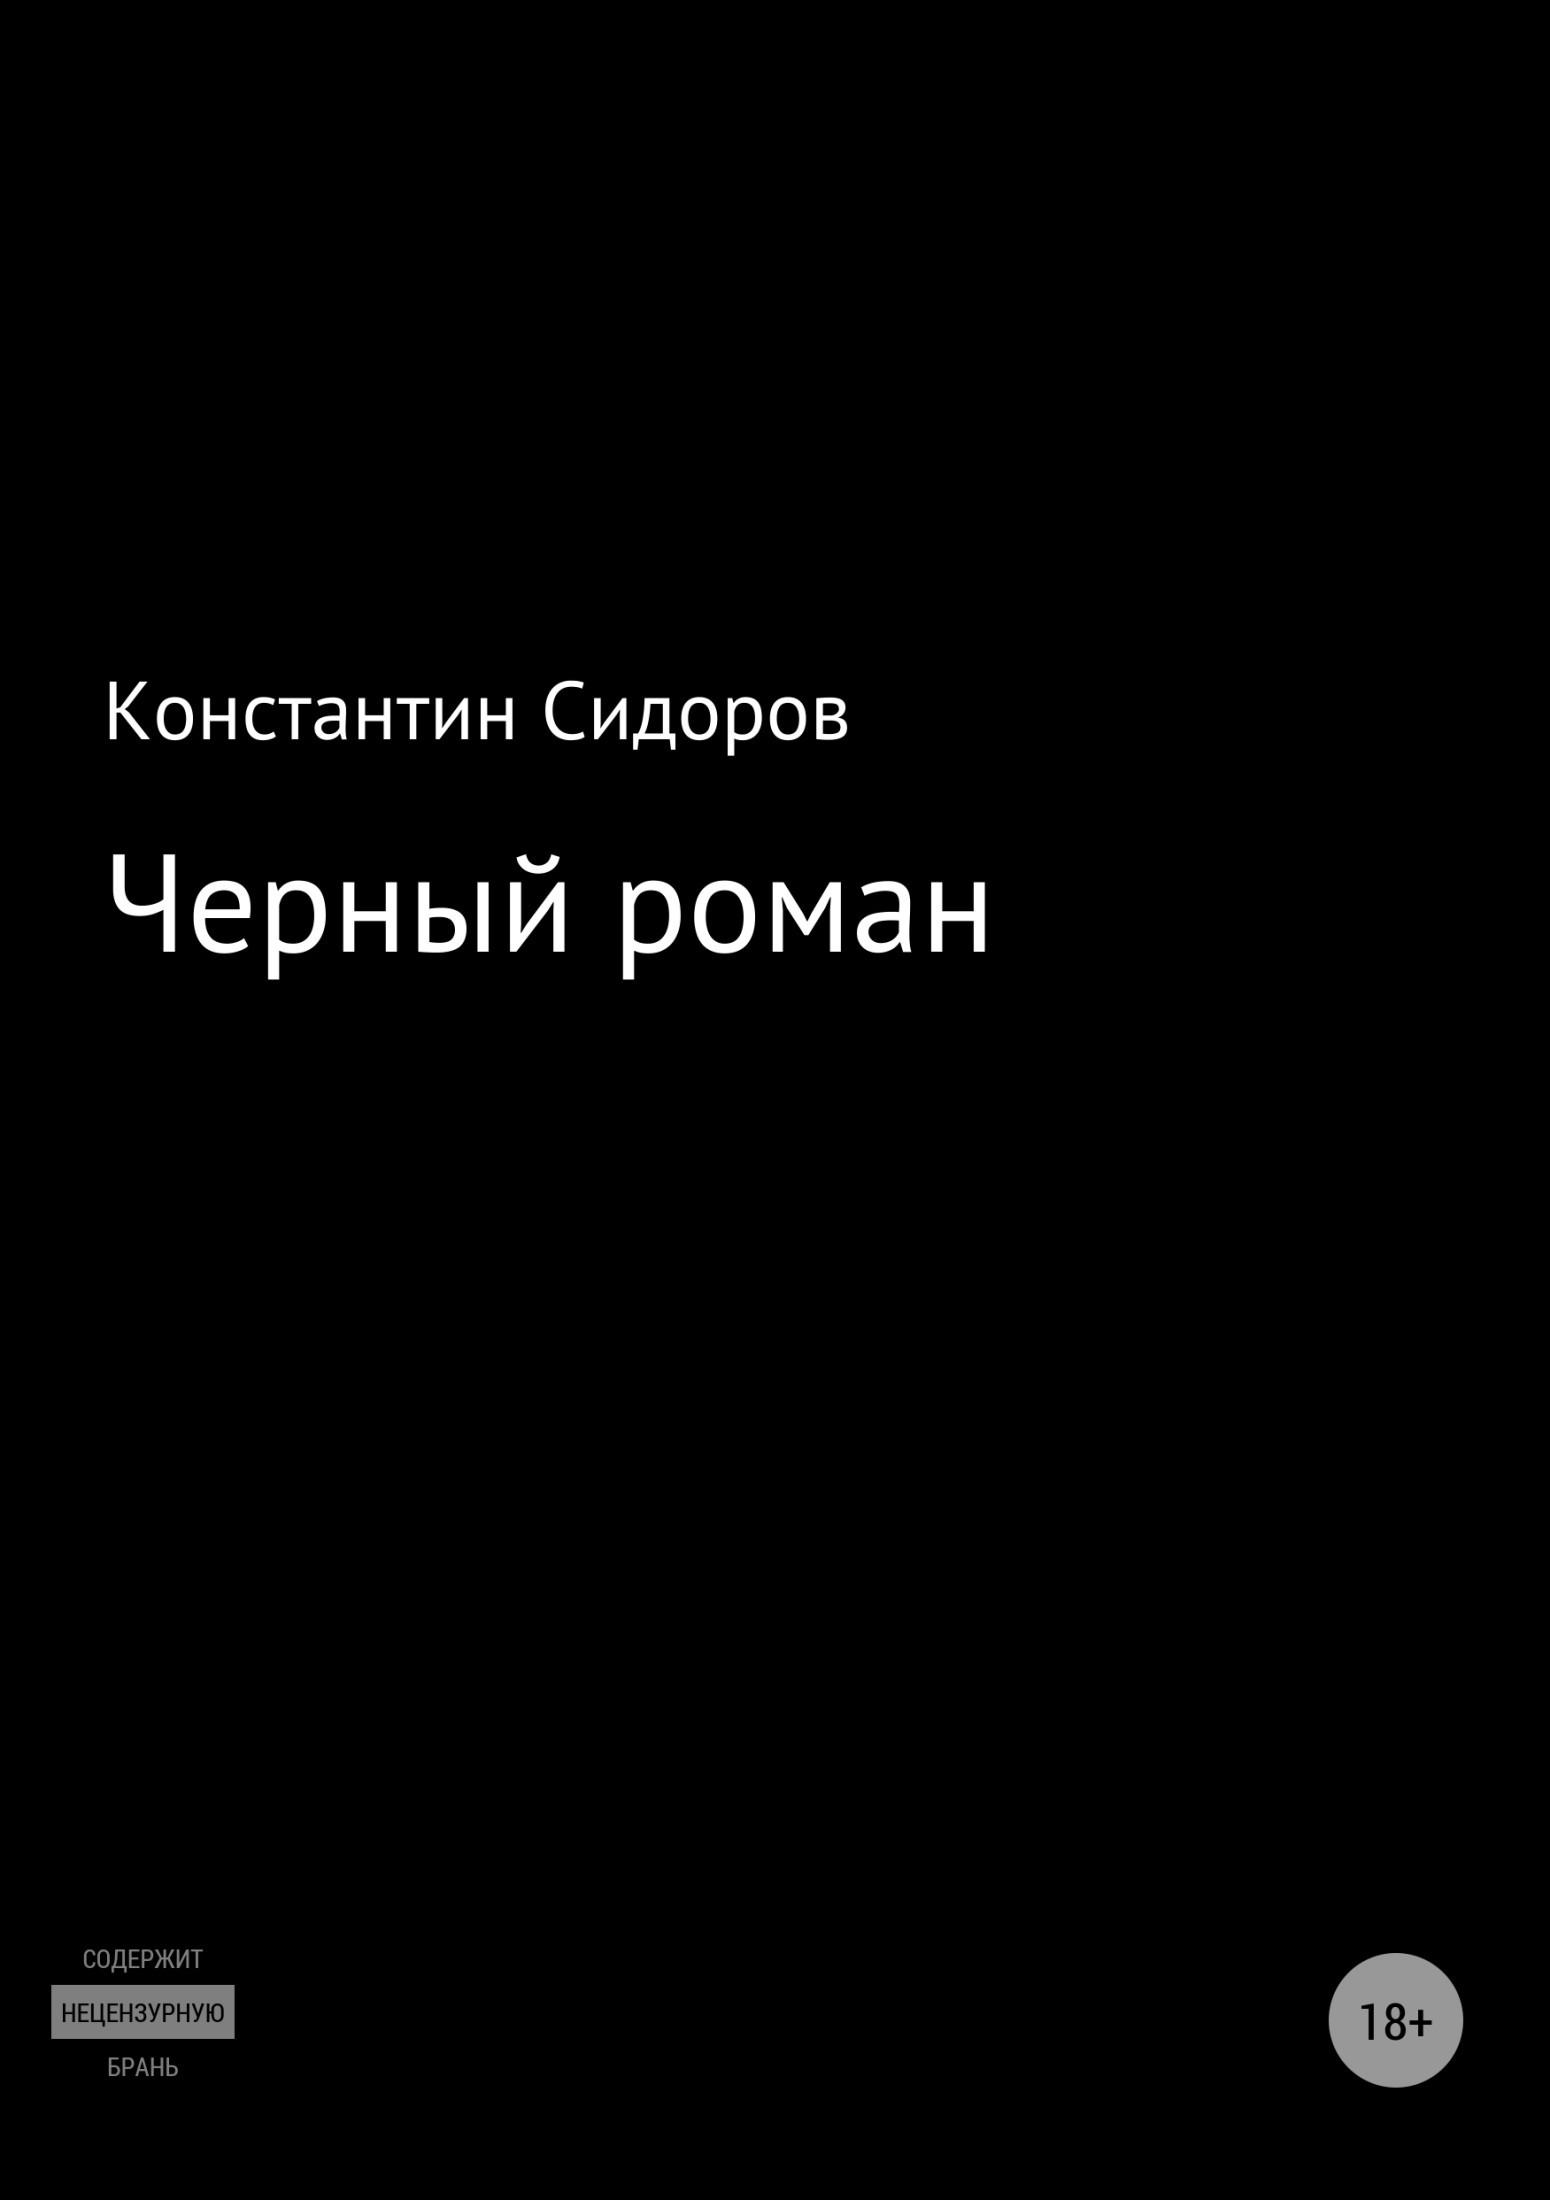 Константин Сидоров бесплатно